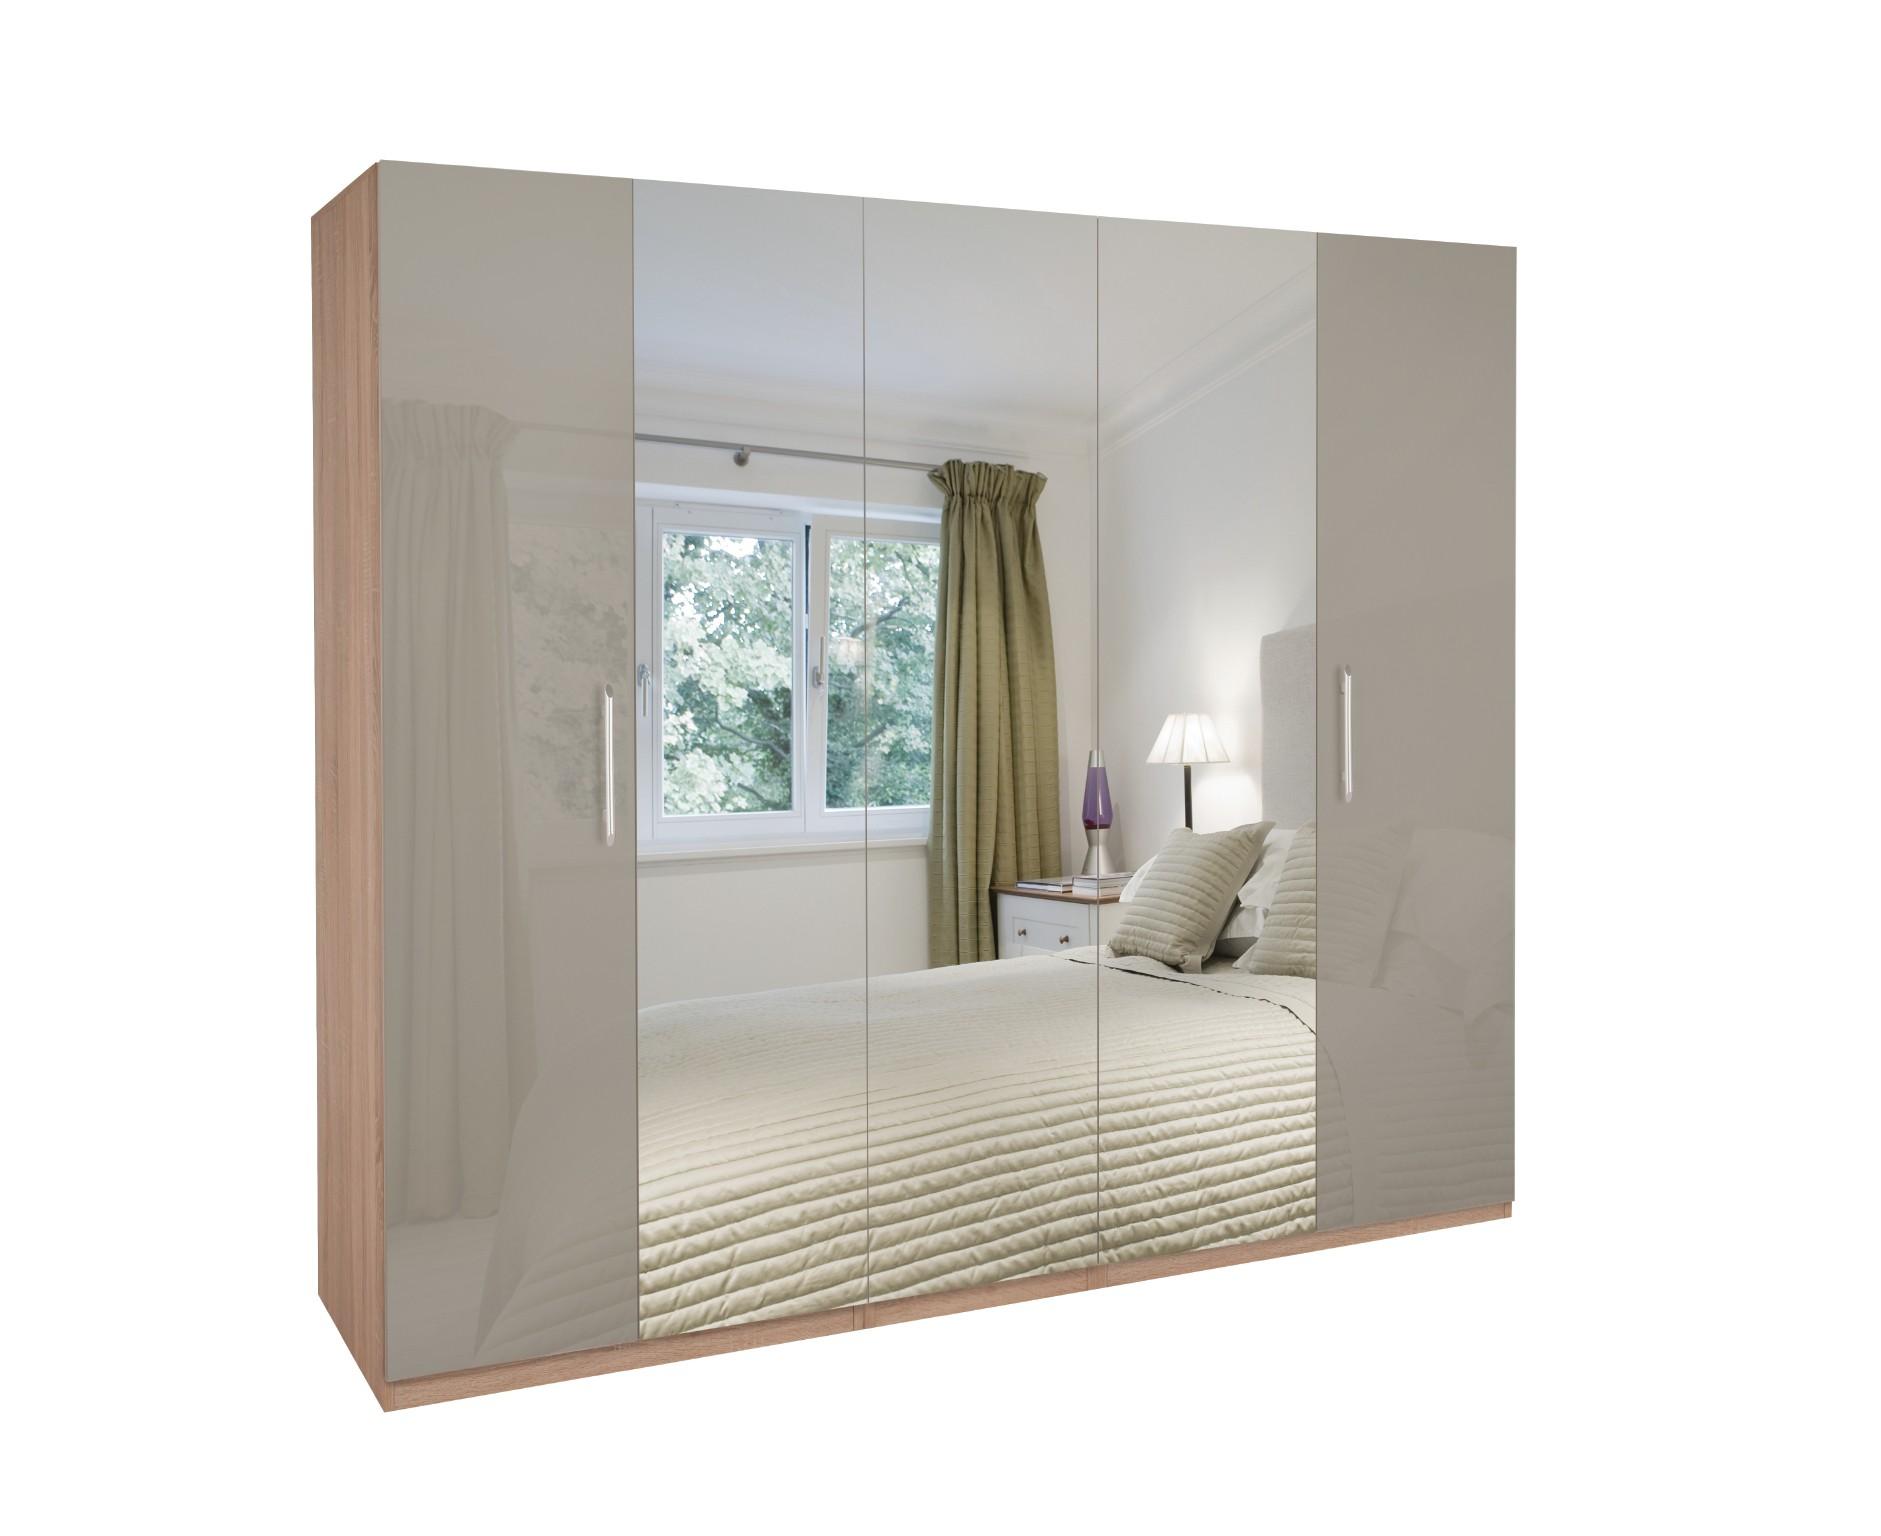 Kensington High Gloss 5 Door Mirrored Wardrobe